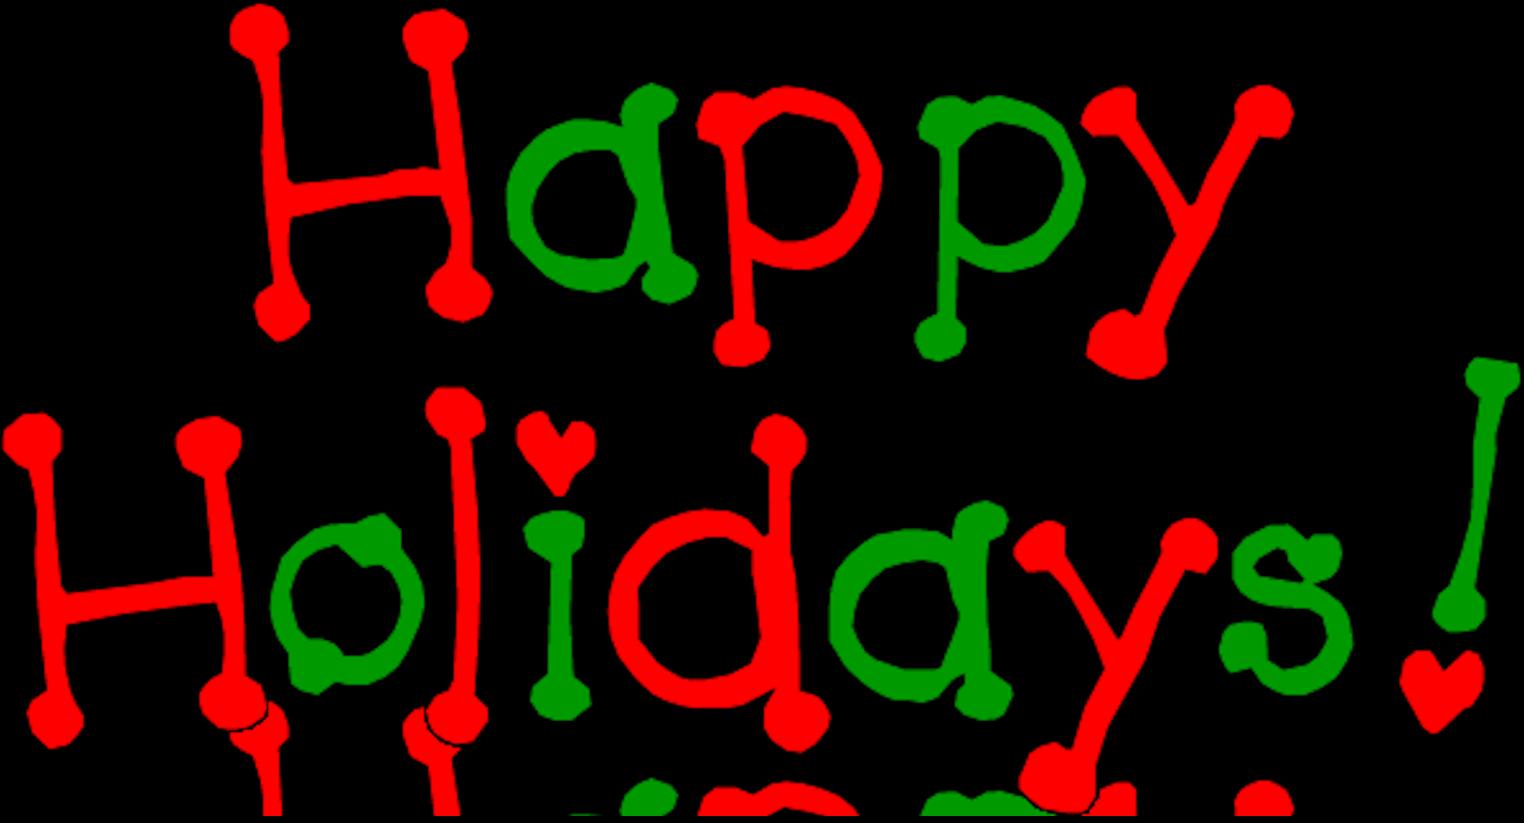 merry christmas   happy holidays from simsvip  simsvip festive season greetings clipart seasons greetings black and white clipart